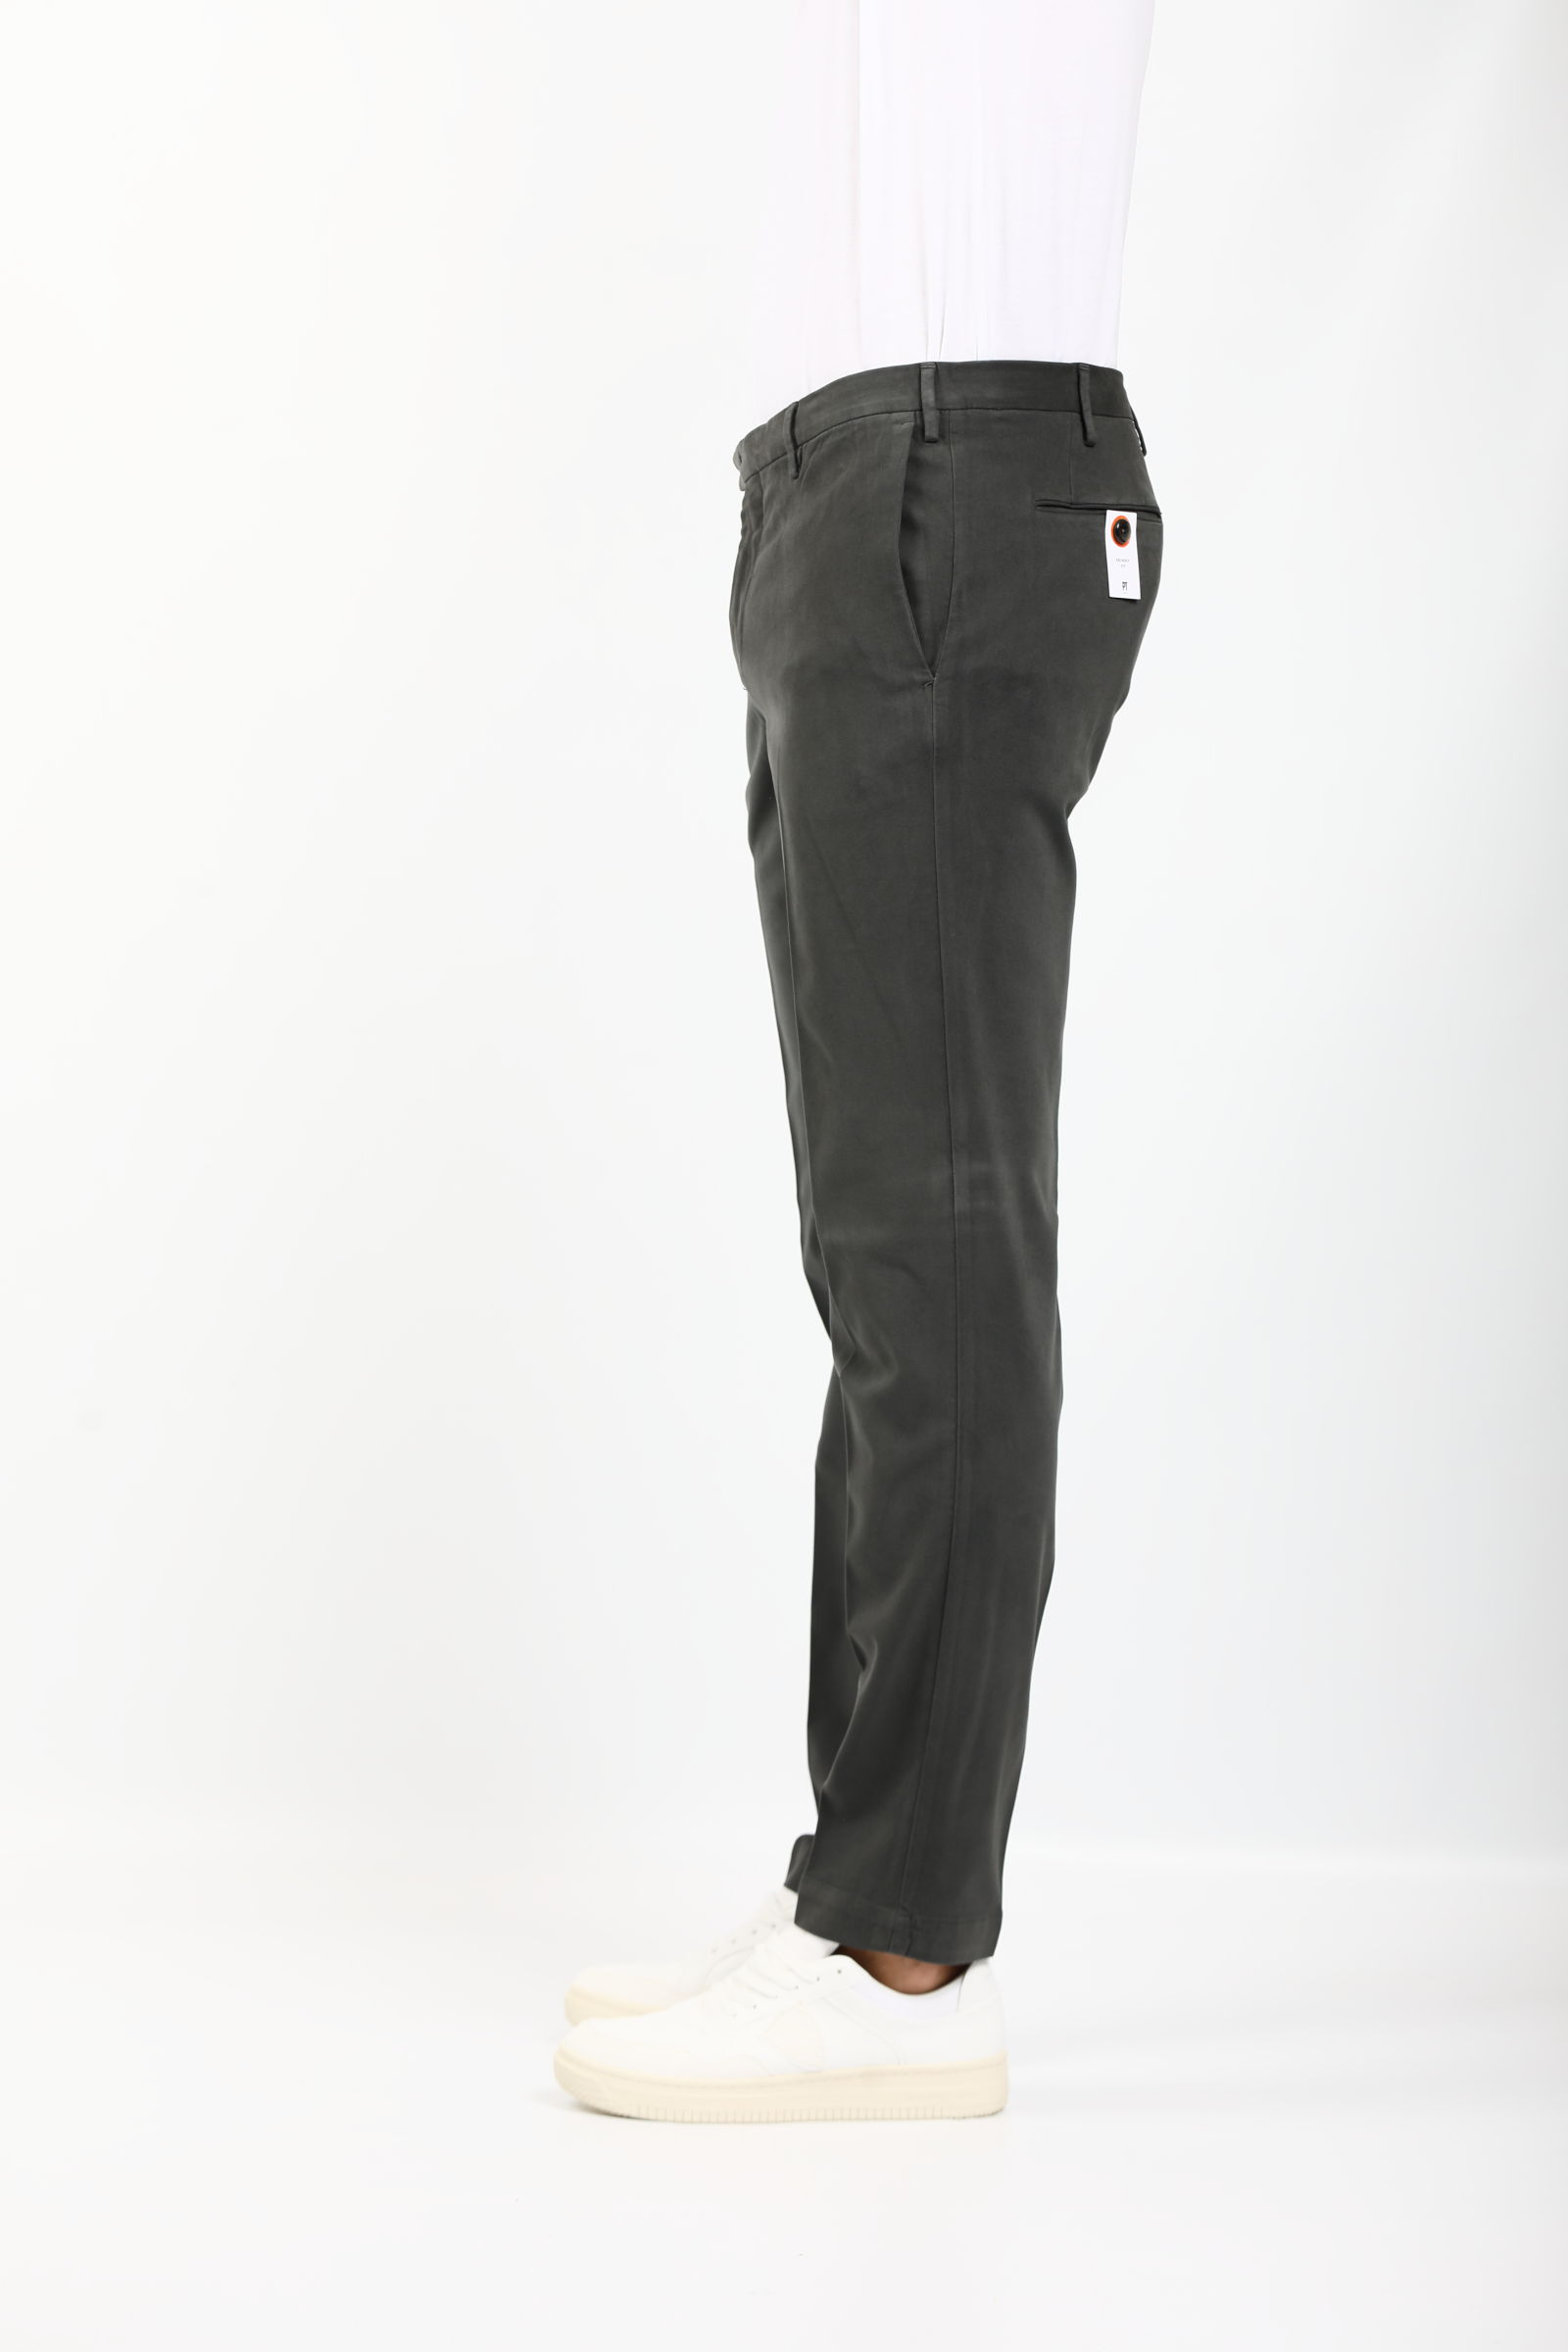 PANTALONE IN GABARDINE PT TORINO | Pantaloni | KTZEZE00CL1-NU460250